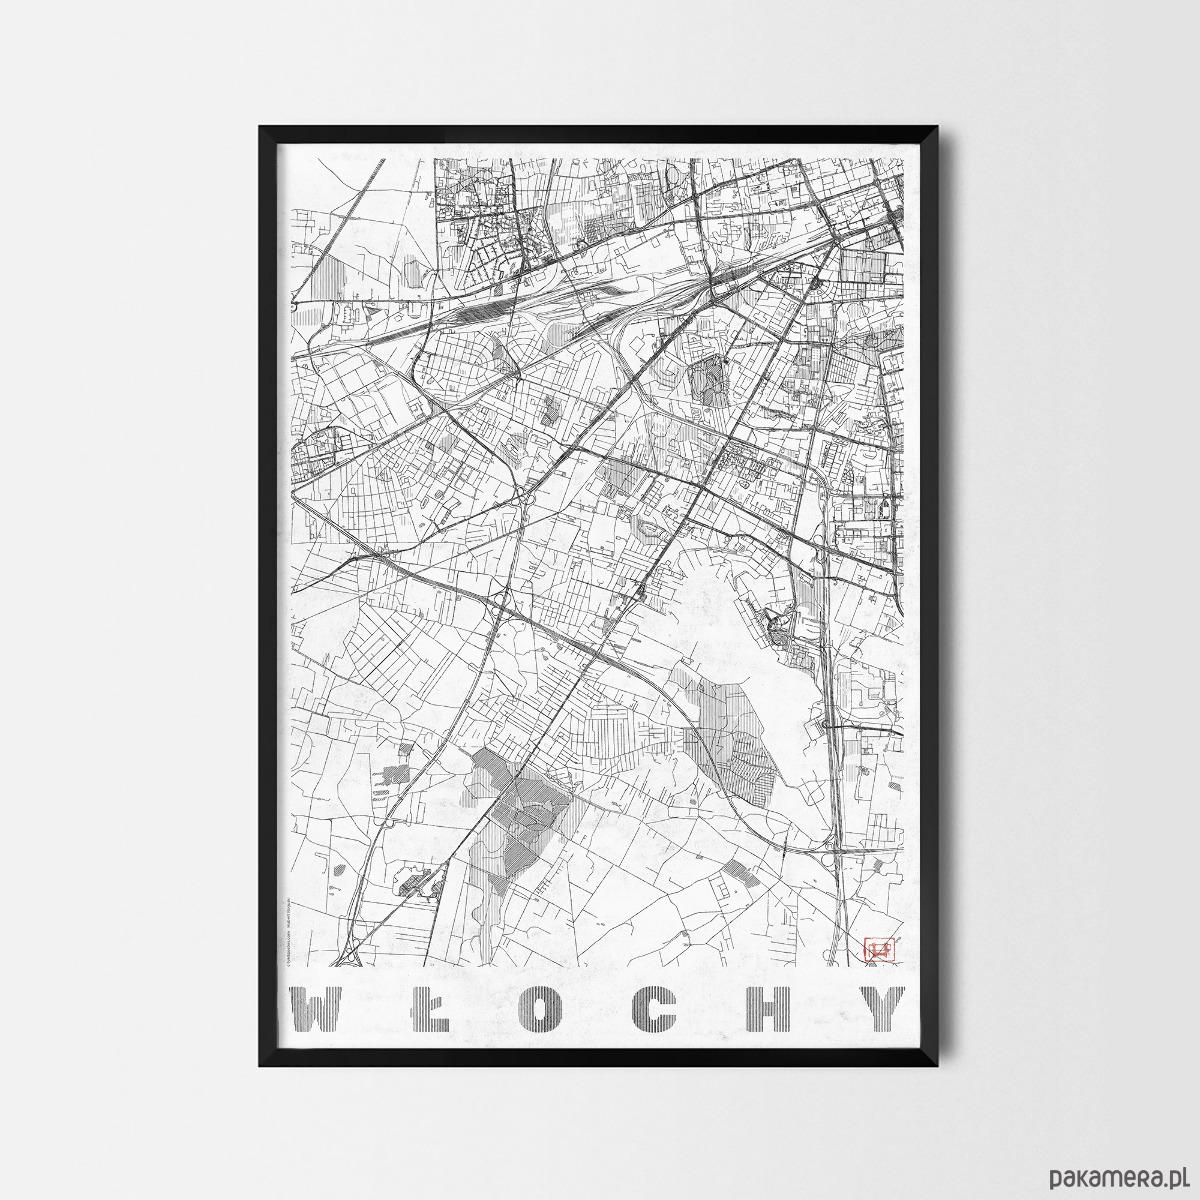 03fdac7bca Plakat Włochy - CityArtPosters - plakaty - Pakamera.pl